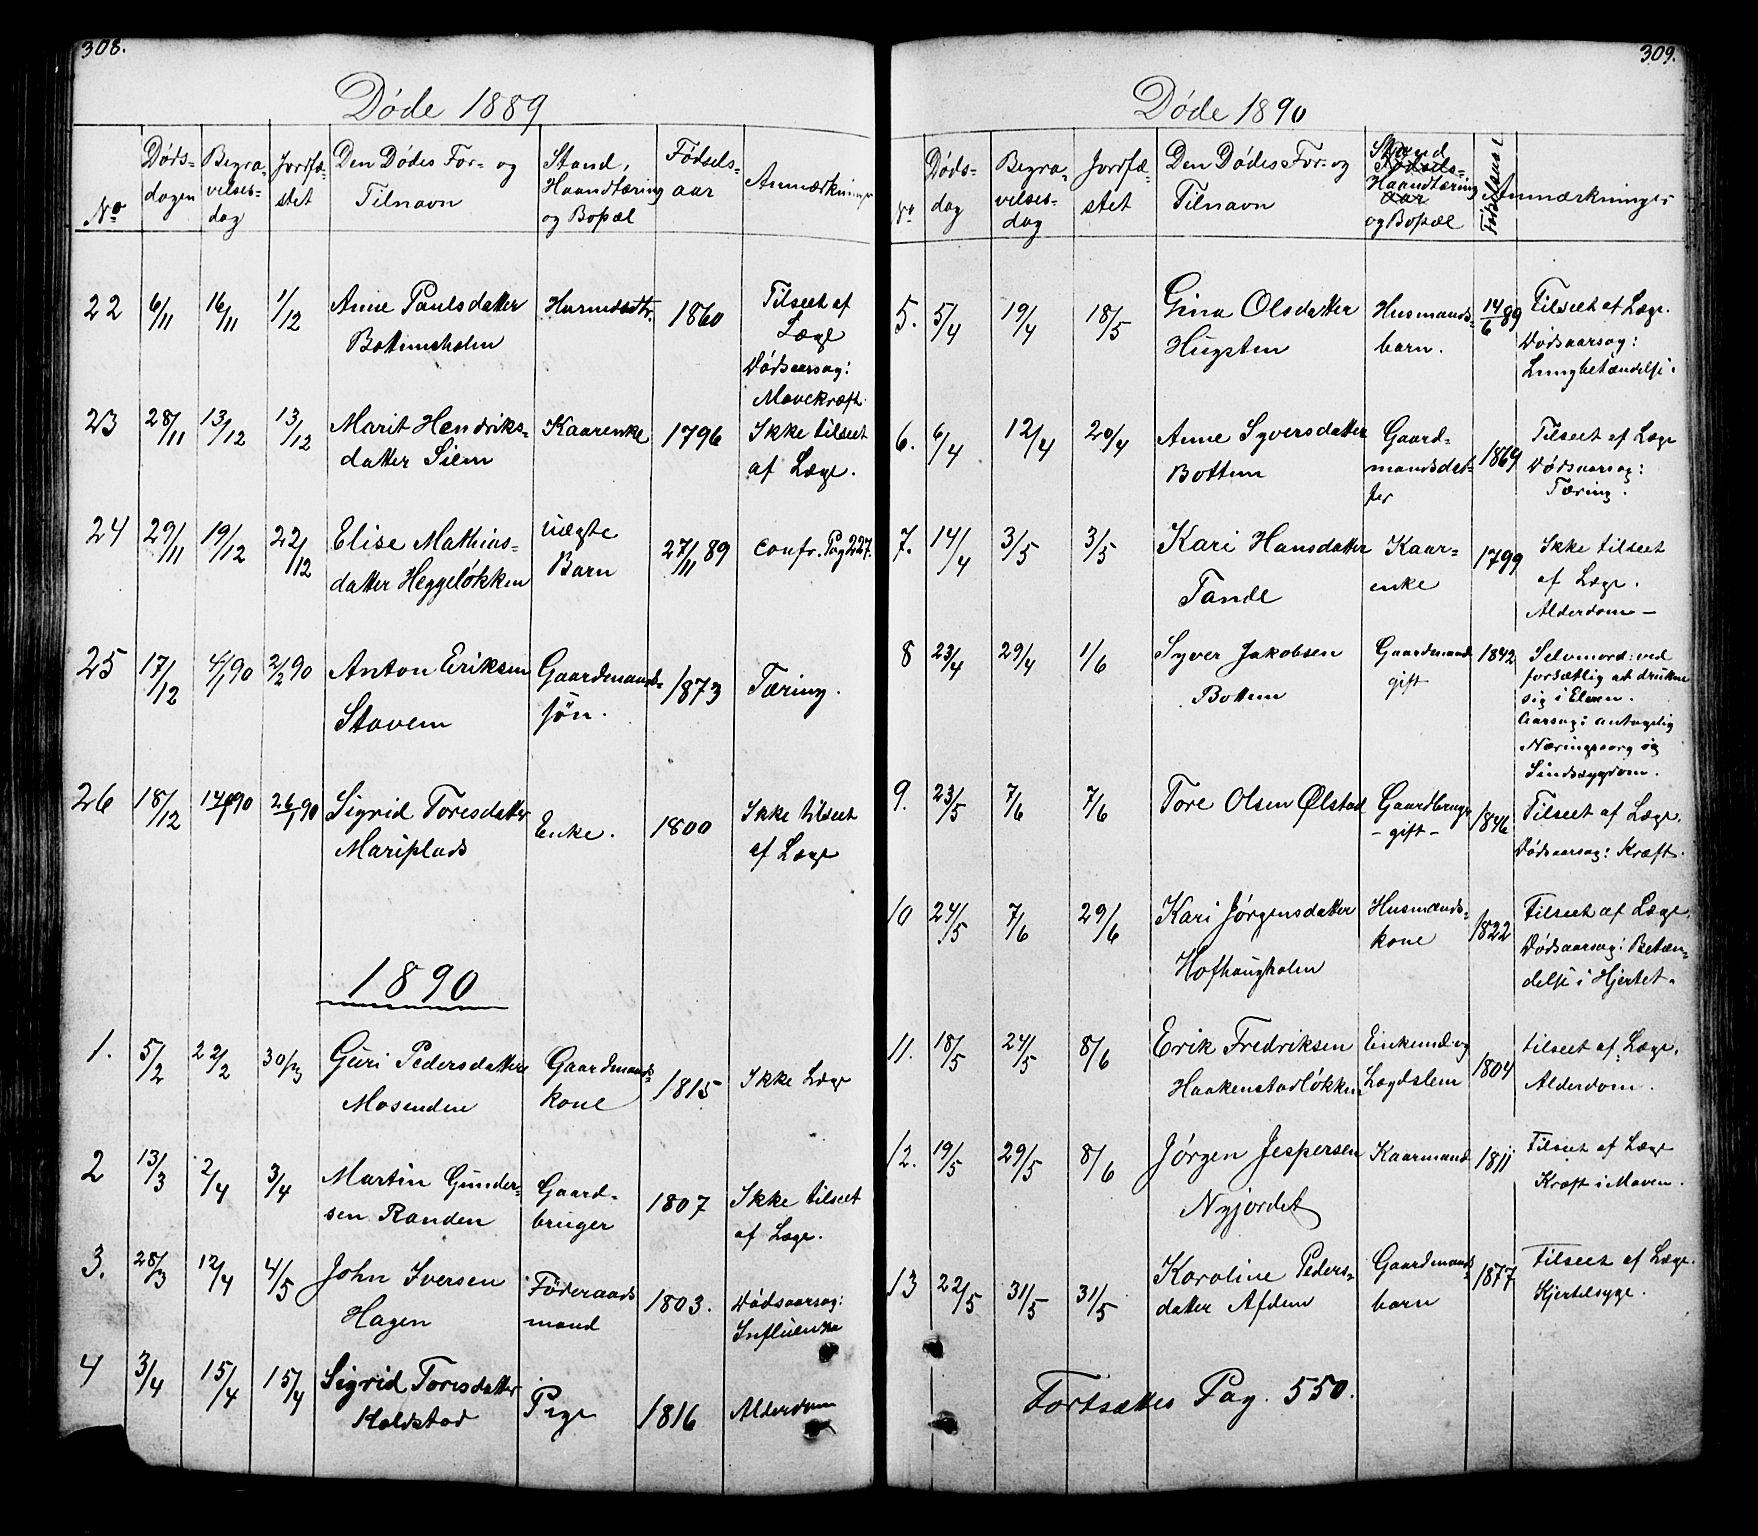 SAH, Lesja prestekontor, Klokkerbok nr. 5, 1850-1894, s. 308-309